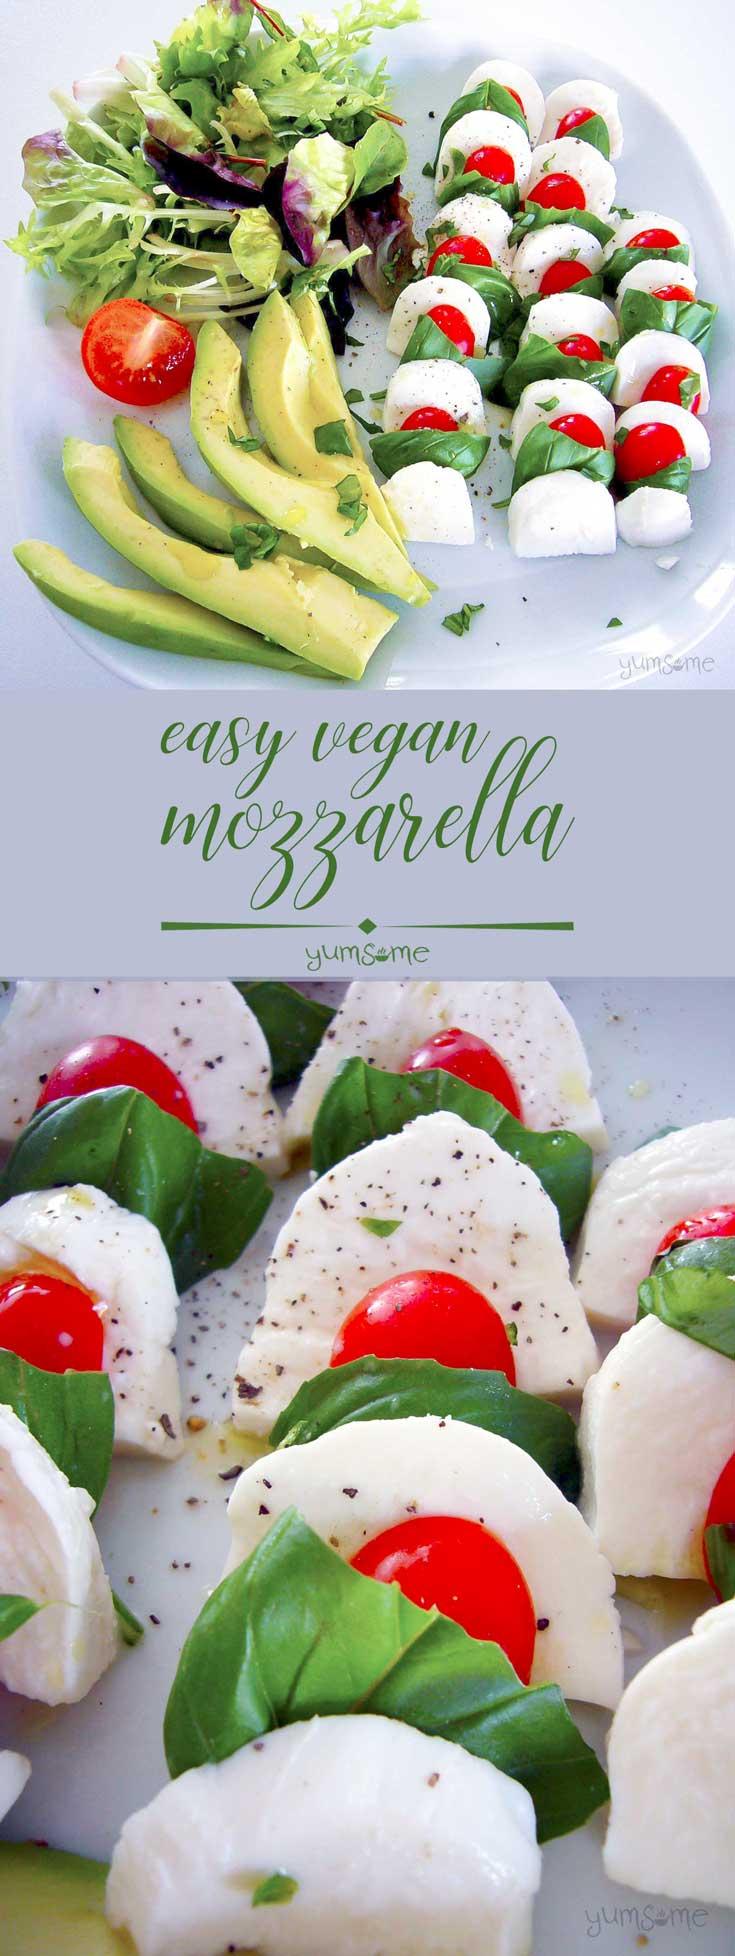 How To Make Easy Meltable Vegan Mozzarella